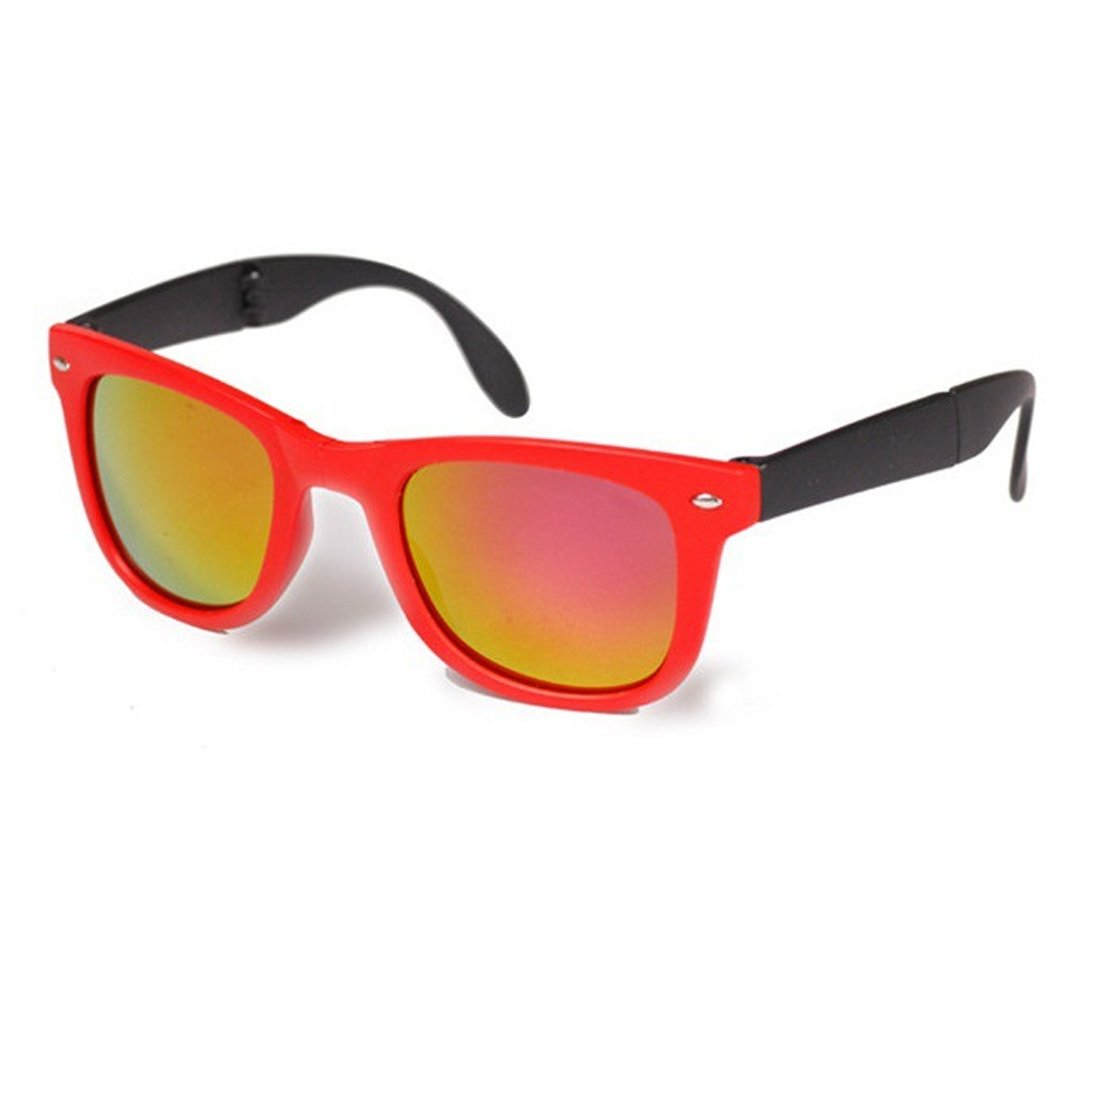 NoyoKere Gafas de sol plegables unisex con caja original Gafas plegables con caja Gafas de sol transparentes dobladas negro